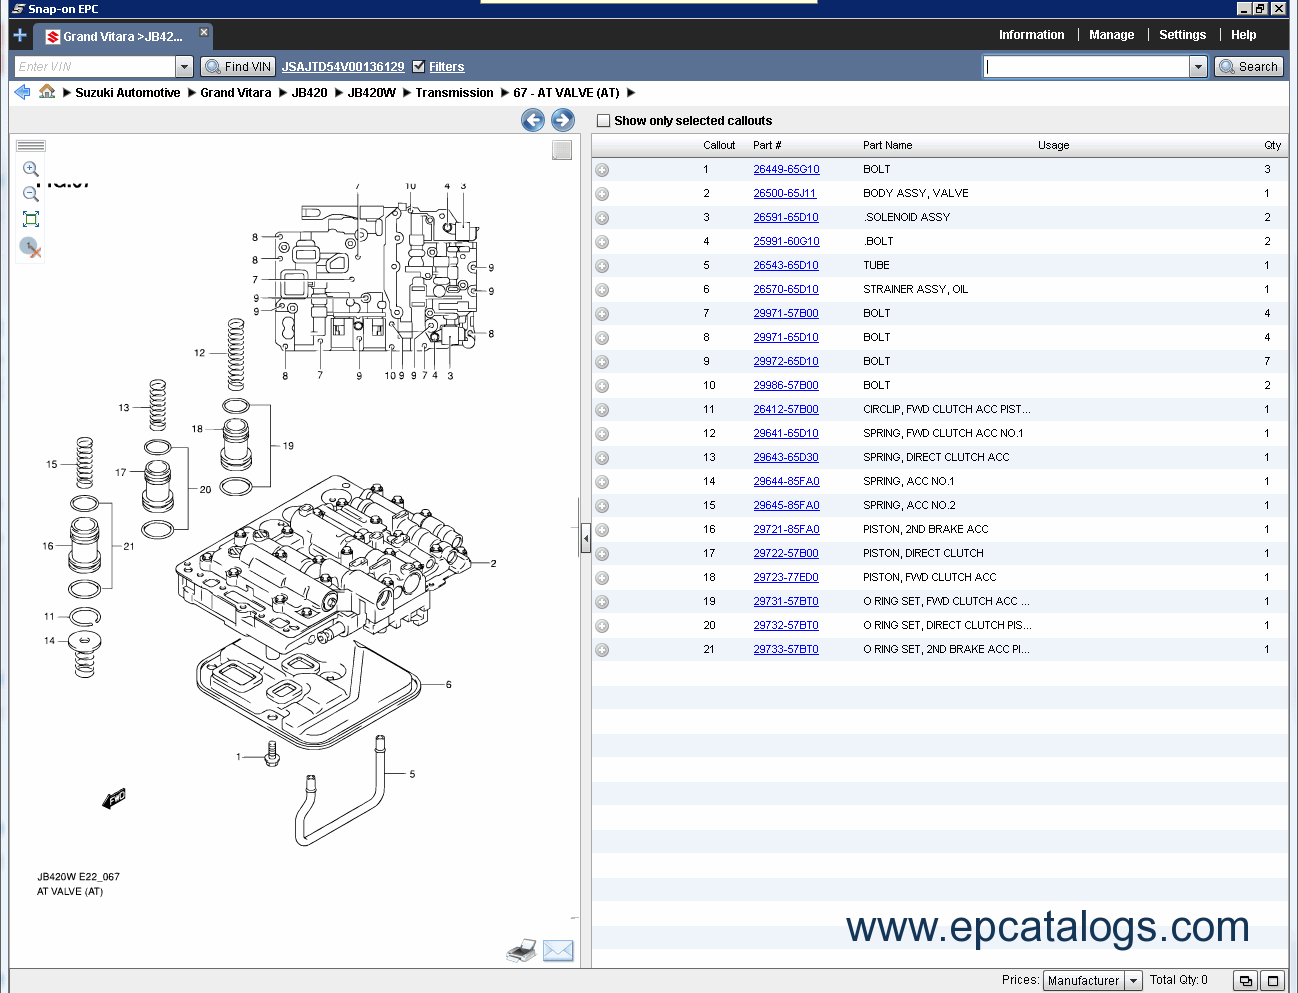 suzuki worldwide automotive epc5 2014 parts catalog download rh epcatalogs com suzuki grand vitara parts catalog pdf suzuki grand vitara parts list